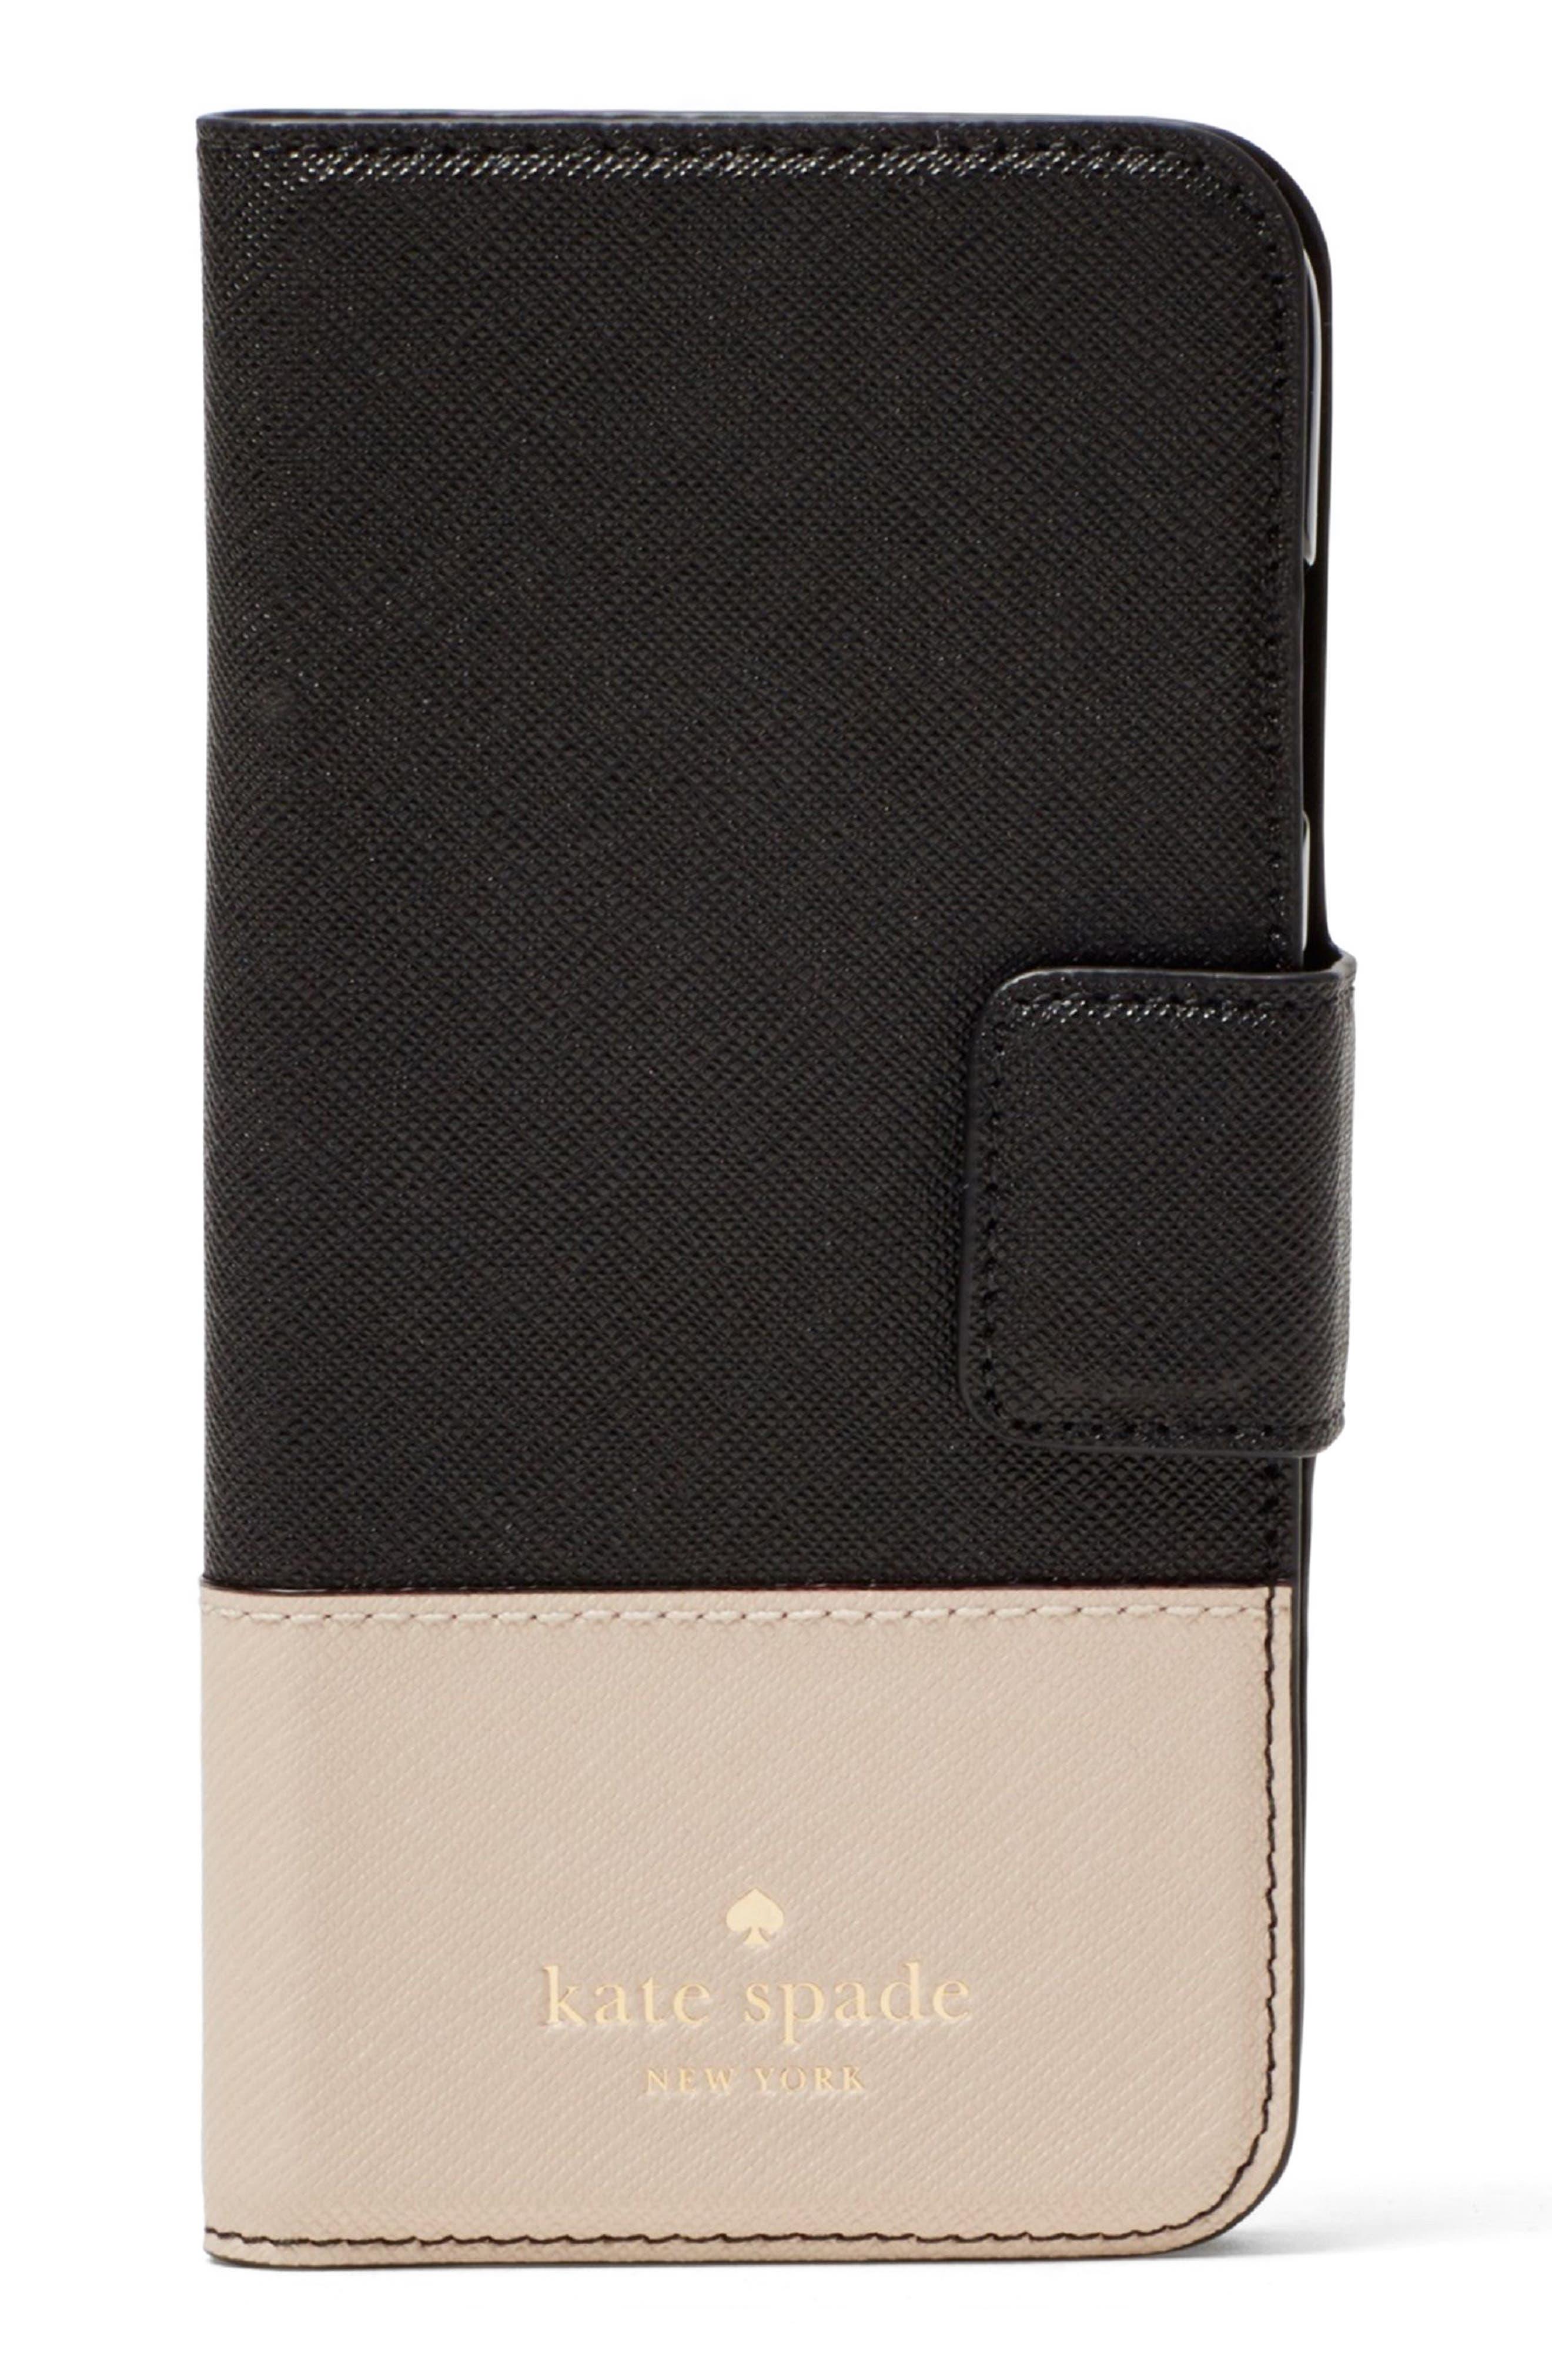 leather iPhone 7/8 & 7/8 Plus case,                             Main thumbnail 1, color,                             Black/ Tusk